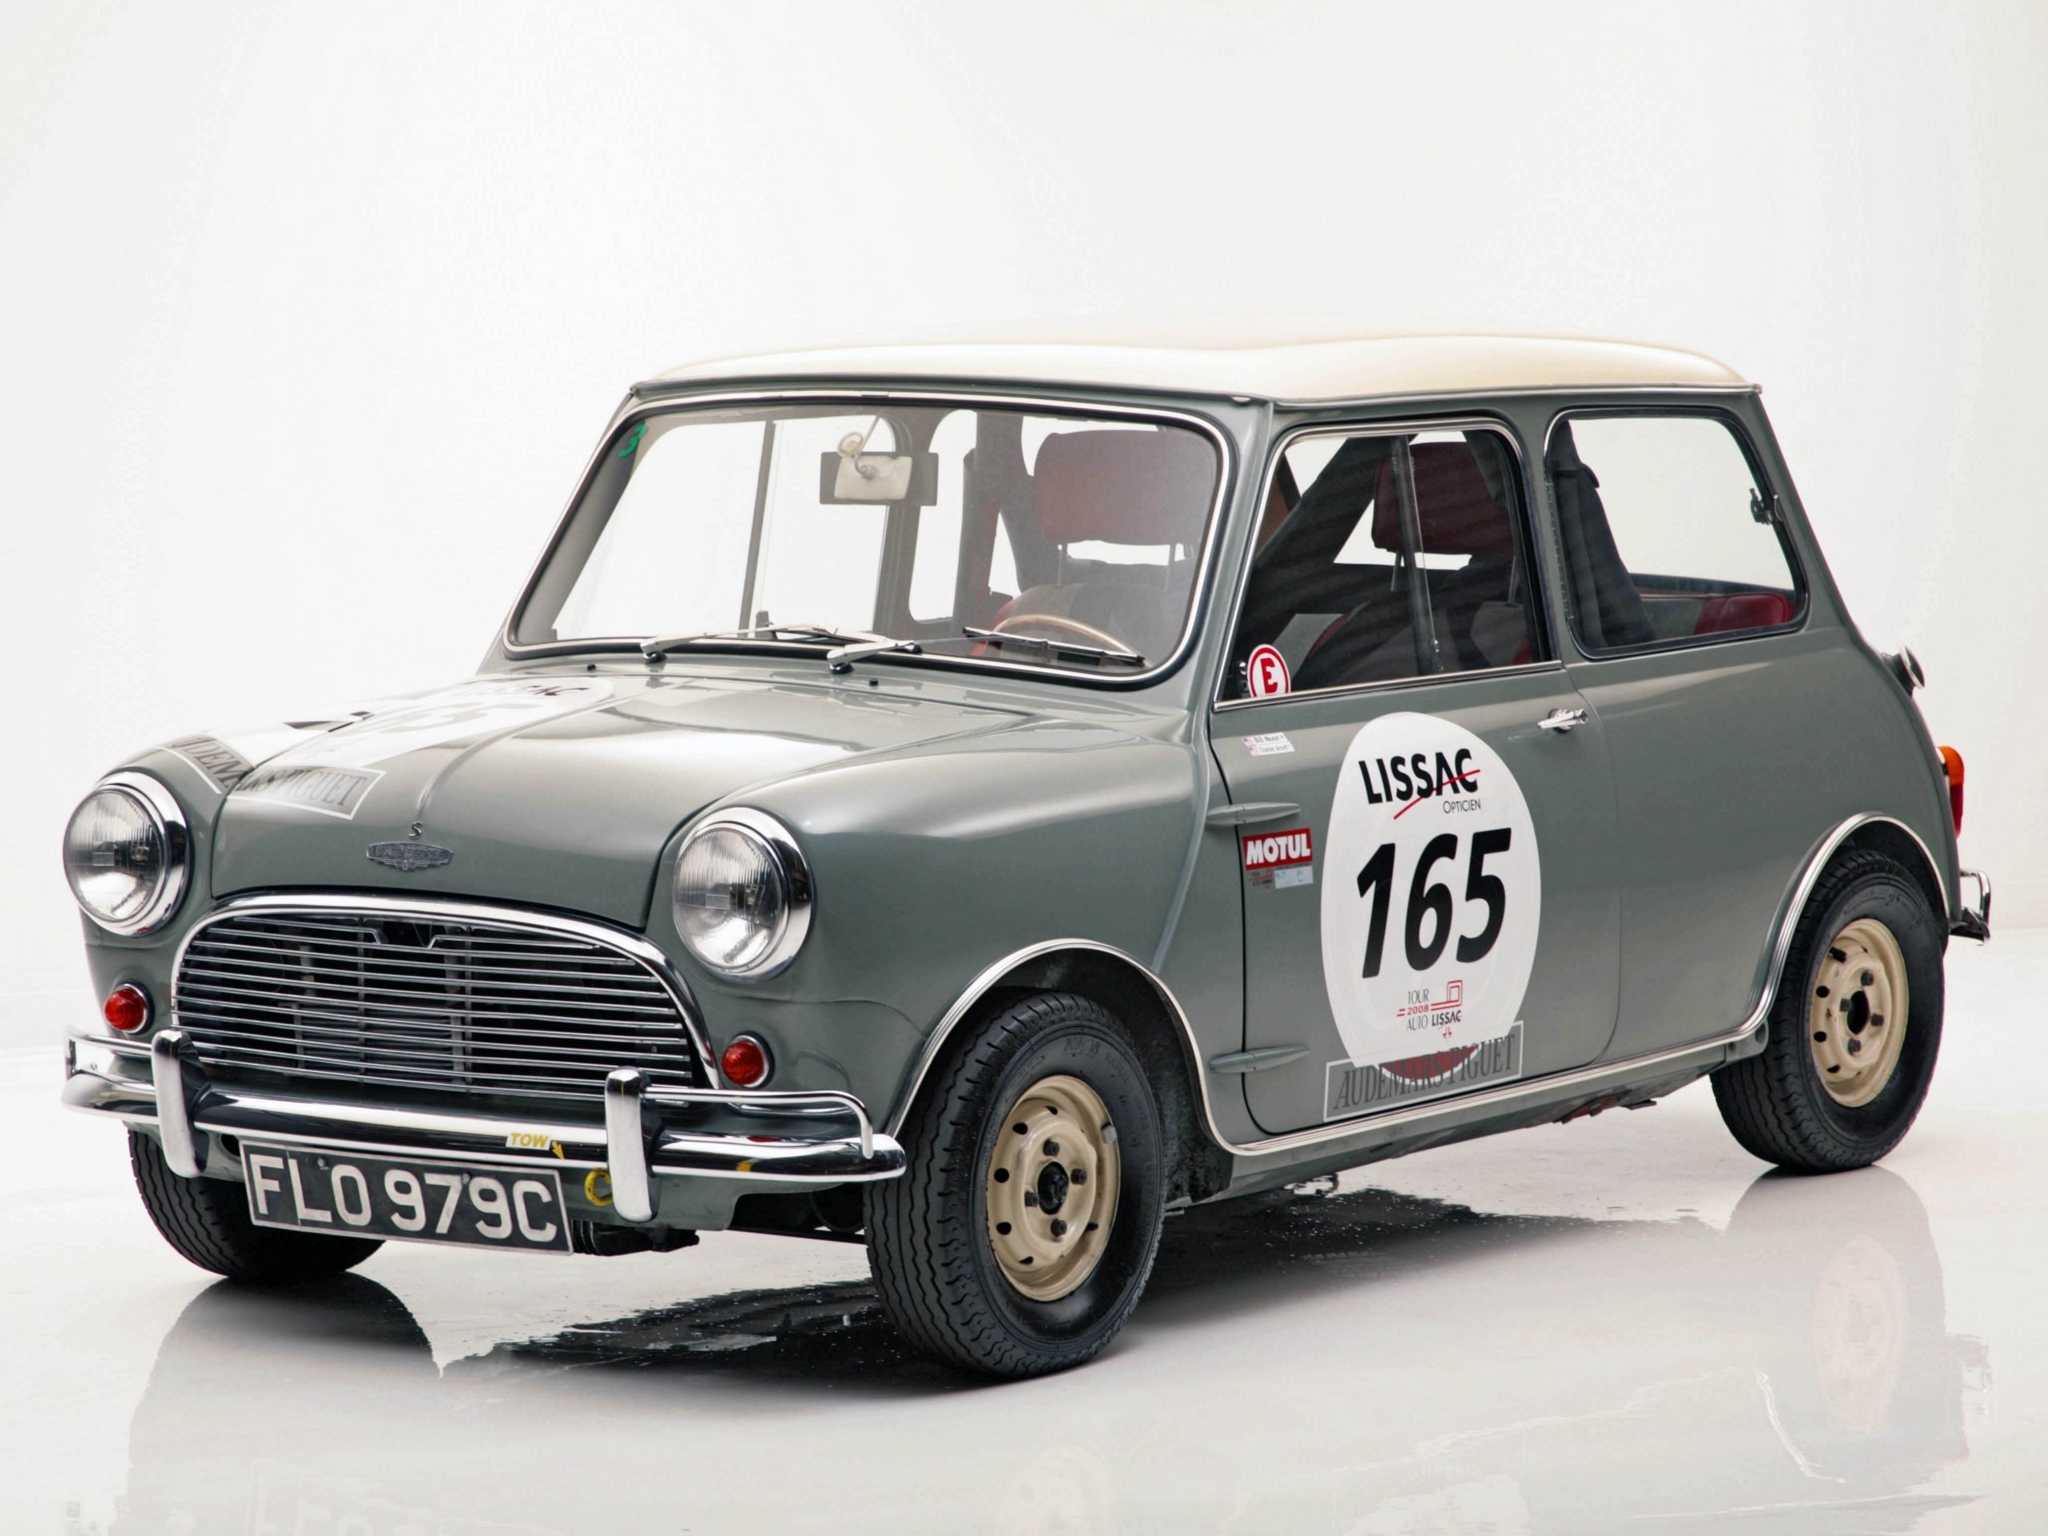 1964 austin mini cooper s rally ado15 race racing classic cooper s g wallpaper 2048x1536. Black Bedroom Furniture Sets. Home Design Ideas